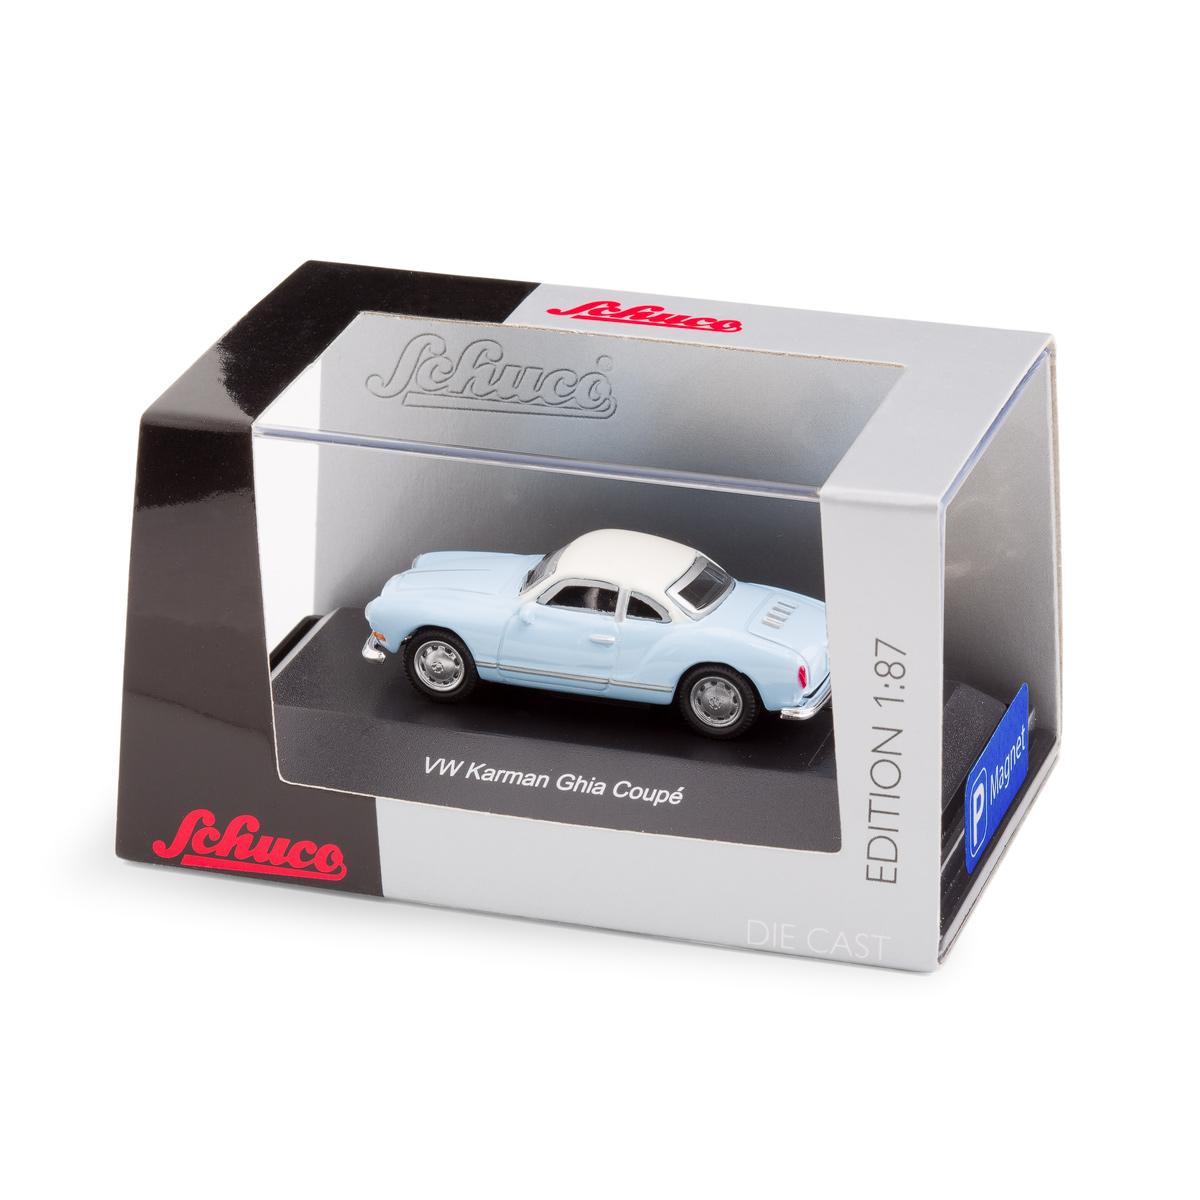 VW Karmann Ghia with underfloor magnet | The Design Gift Shop